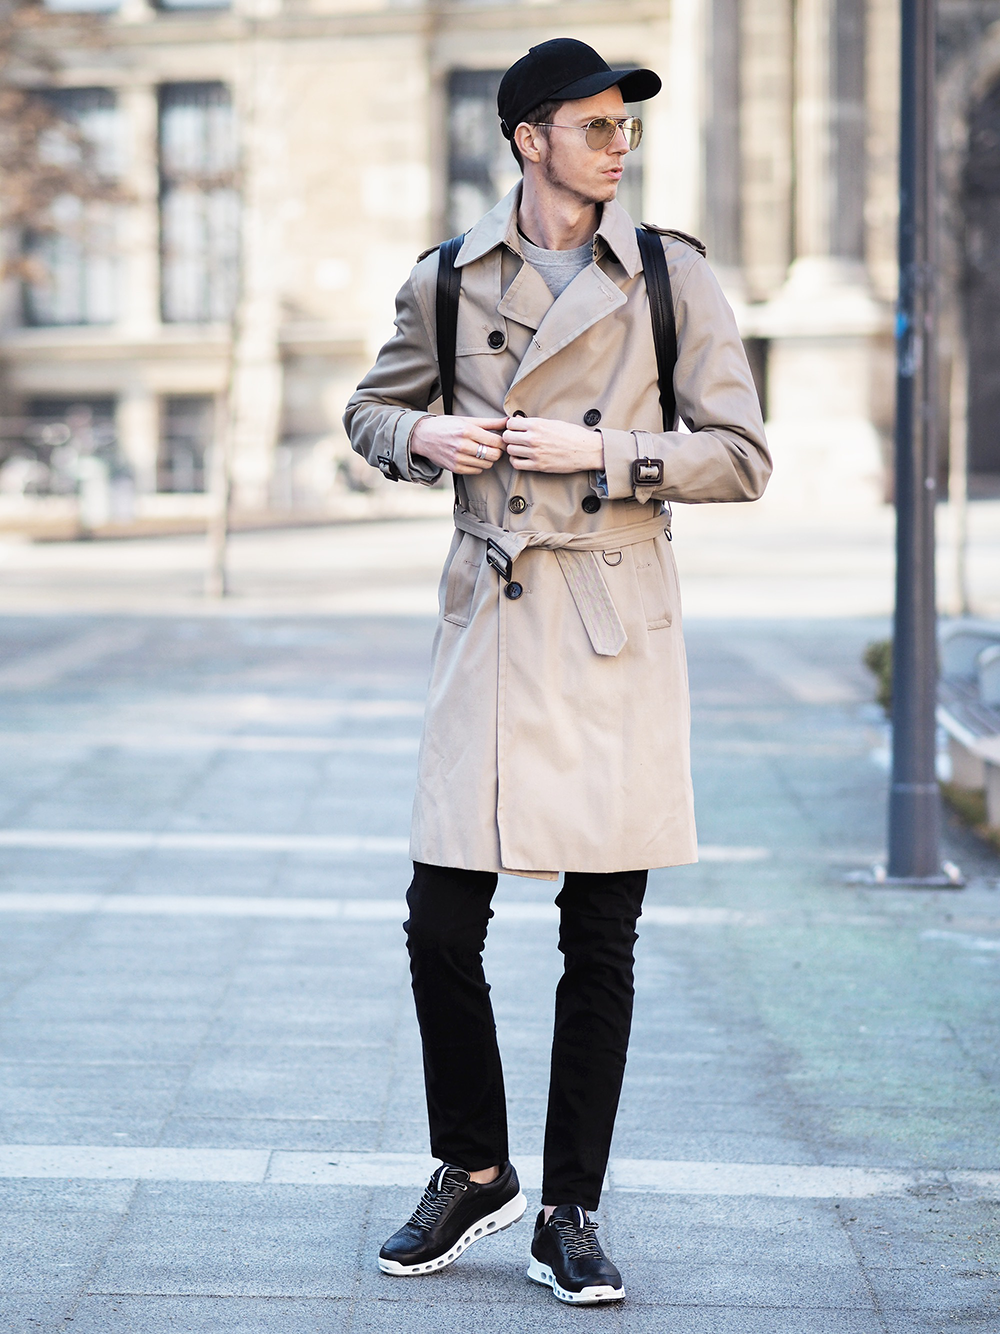 ecco-cipo-ferfi-street-style-ferfidivat-blogger-divatblogger-chaby-smizedivat_7.png